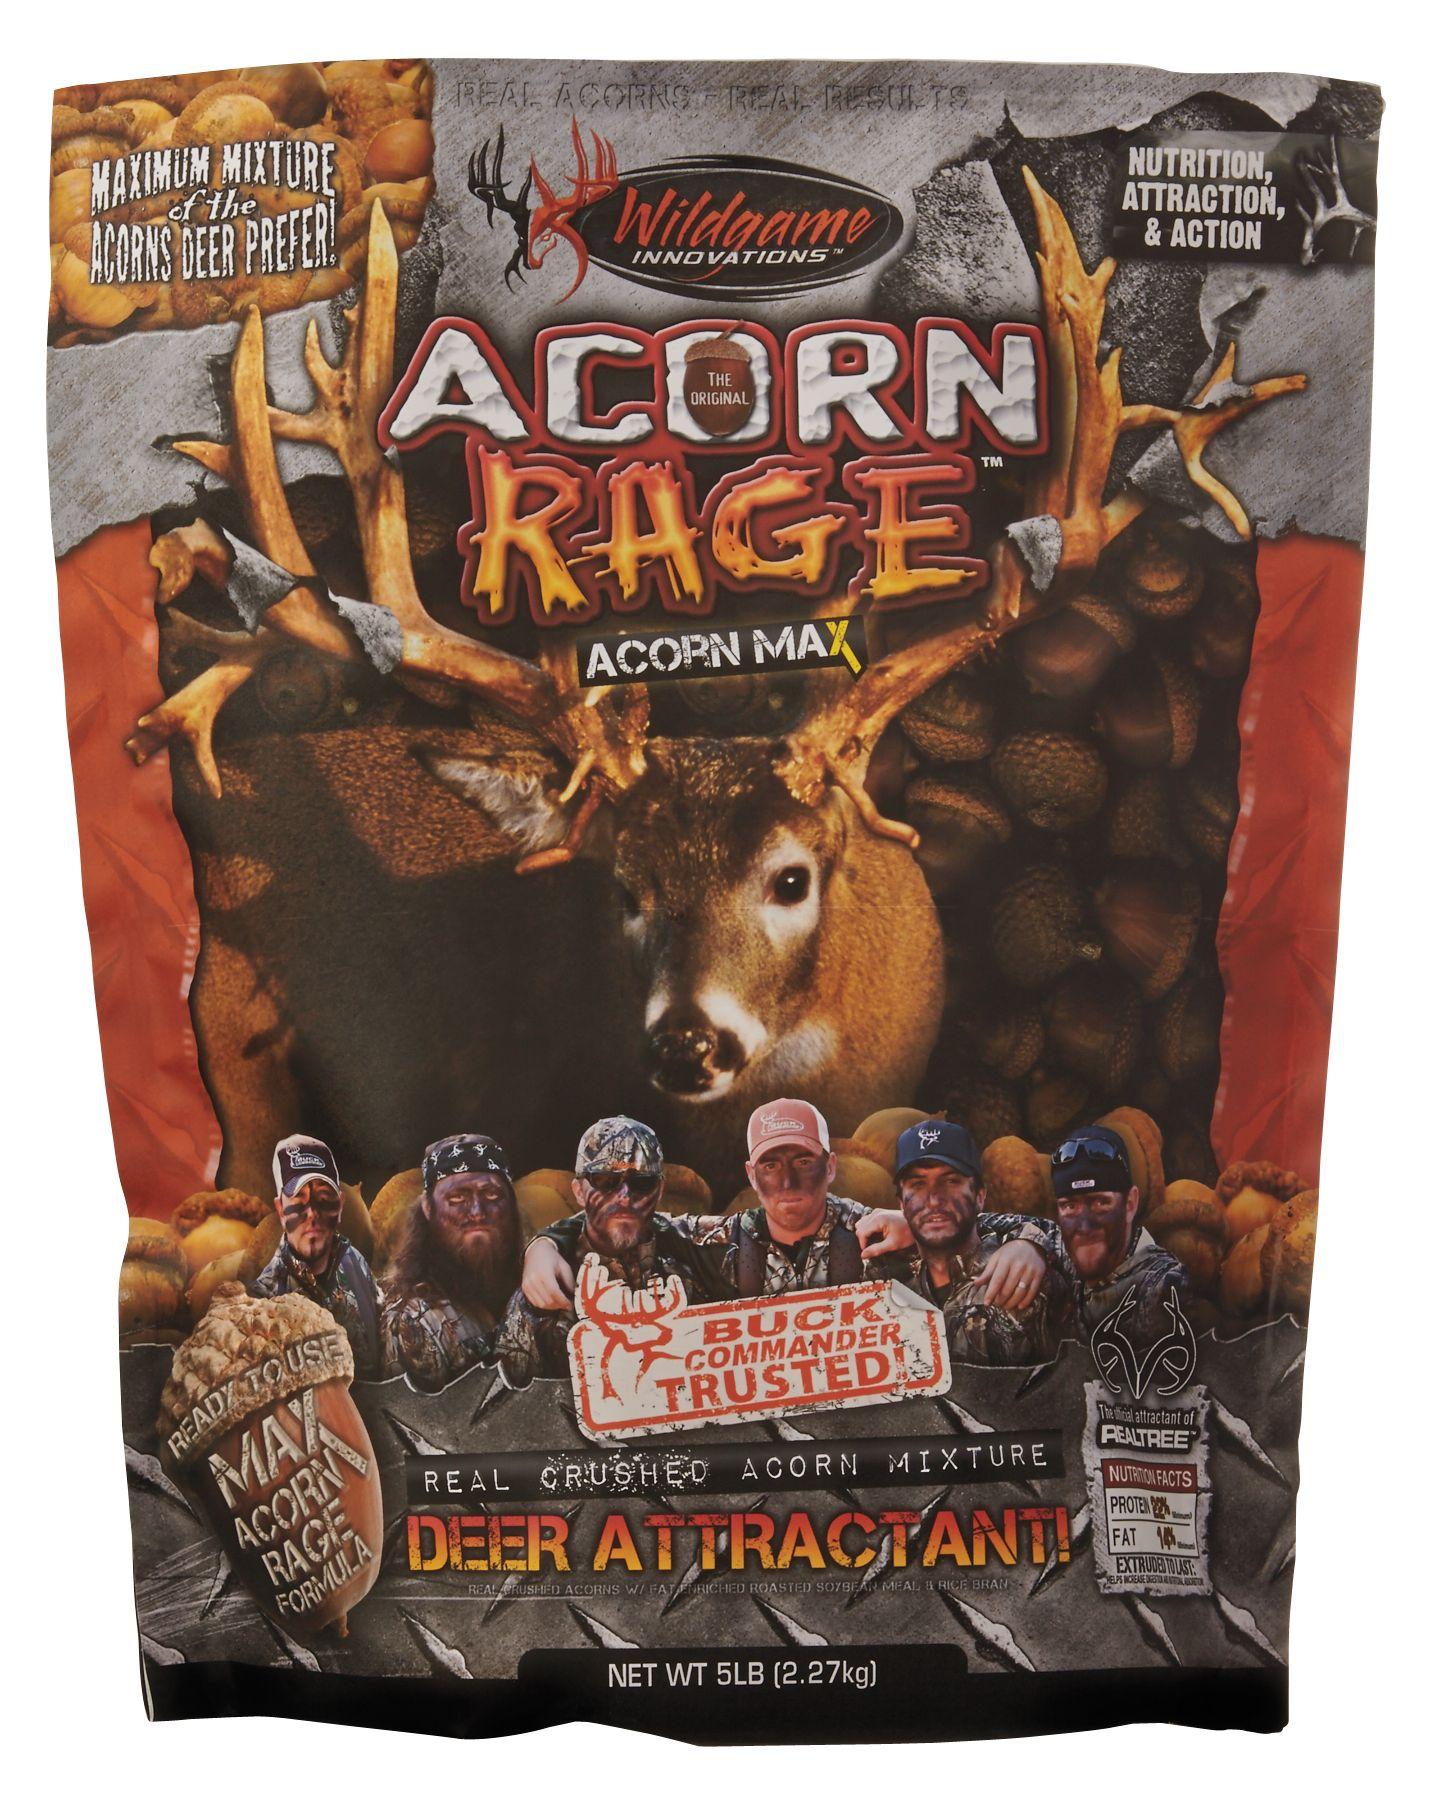 Deer attractants dicks sporting goods product image wildgame innovations buck commander acorn rage attractant 5 lbs publicscrutiny Gallery